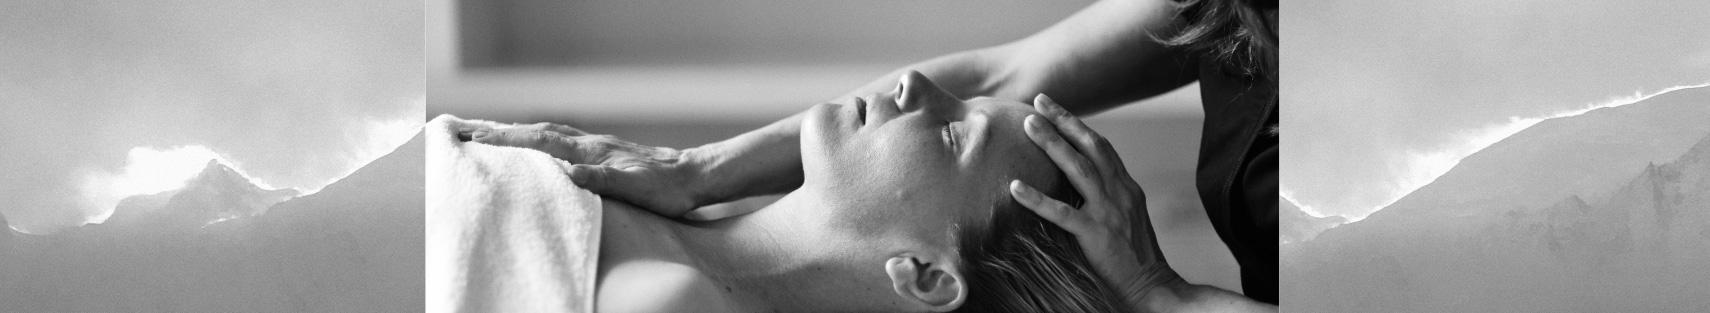 Massage Chamonix Notre equipe